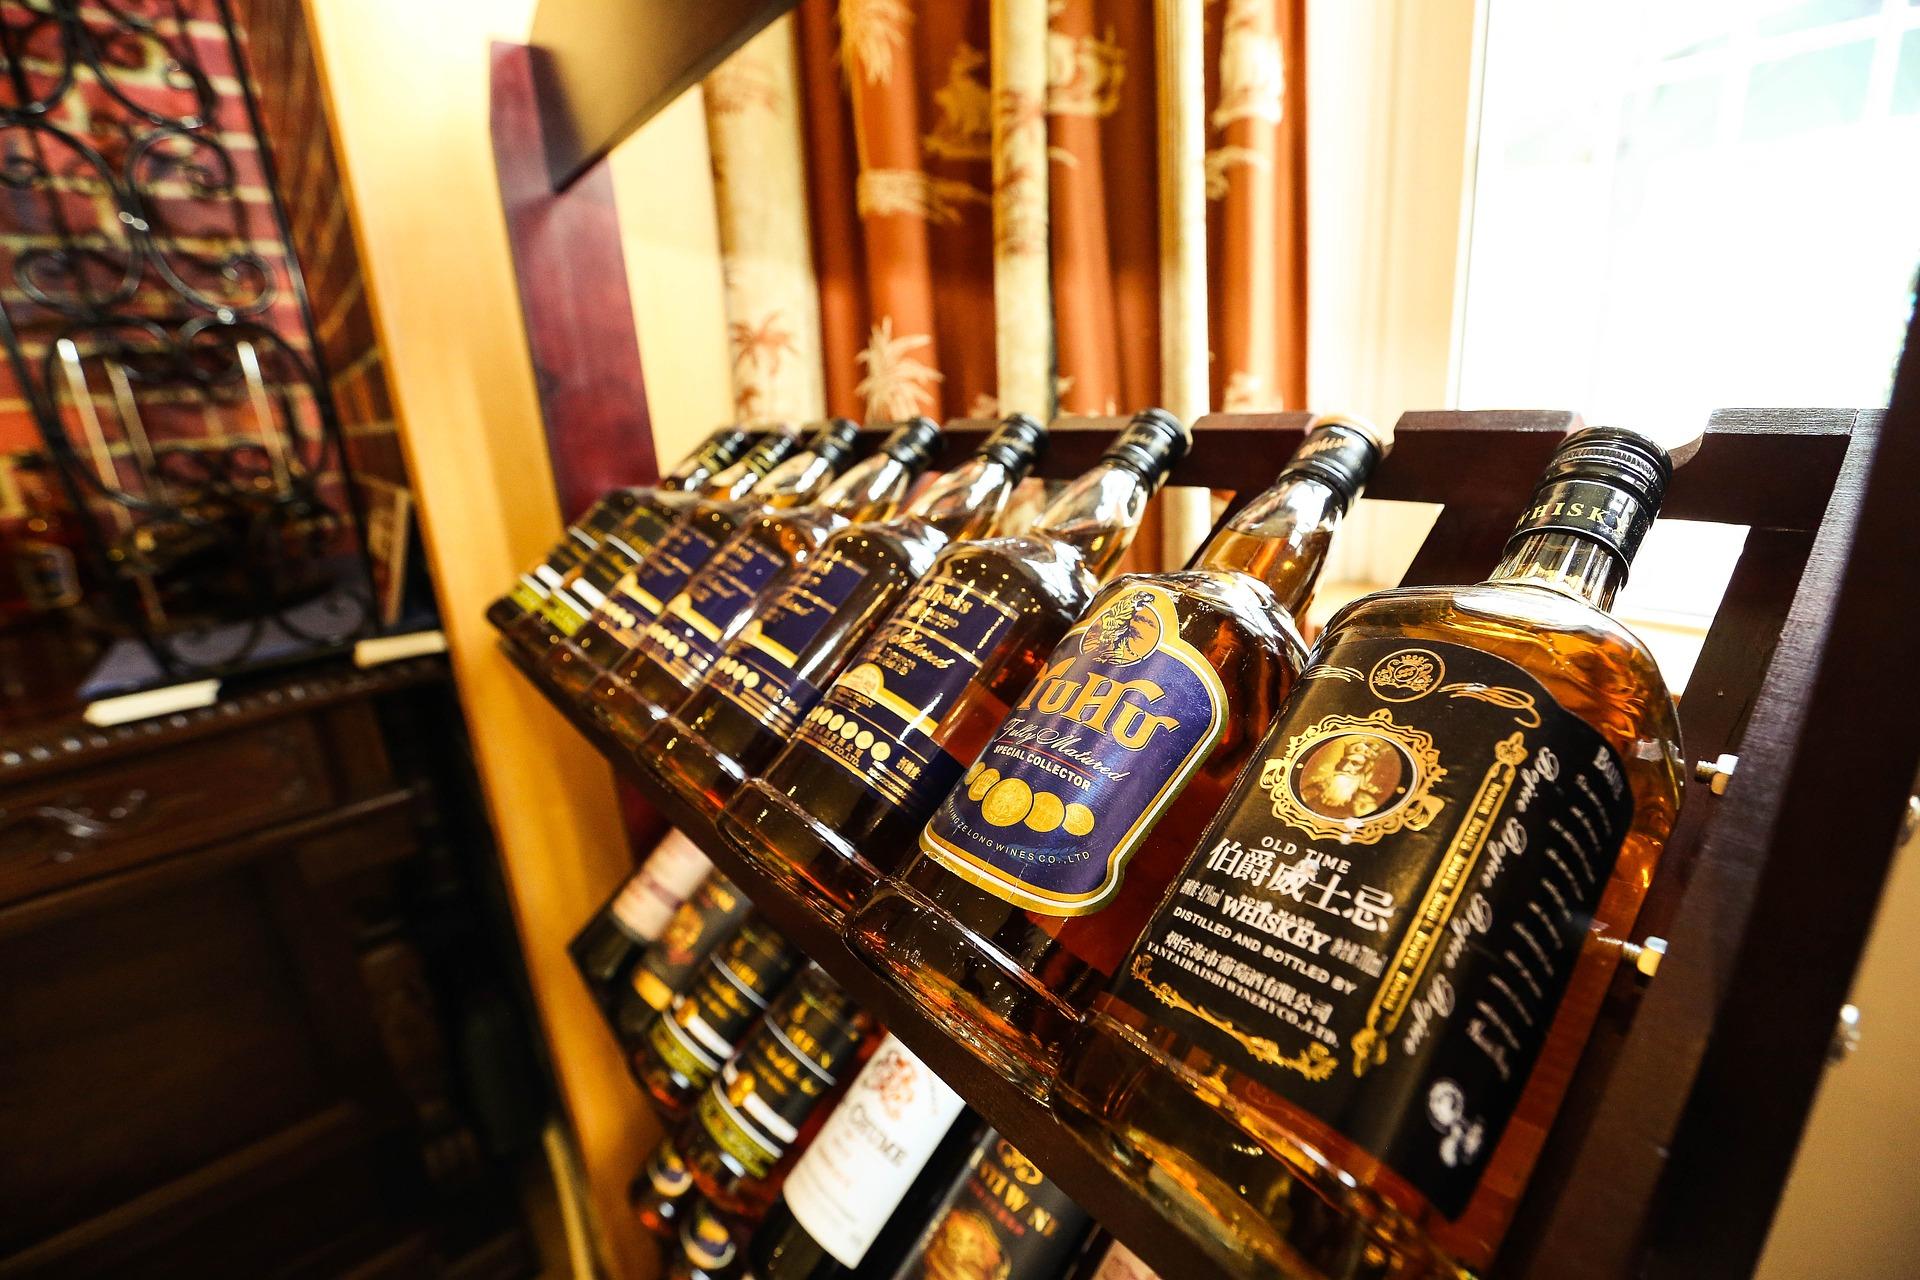 Diverse whiskey